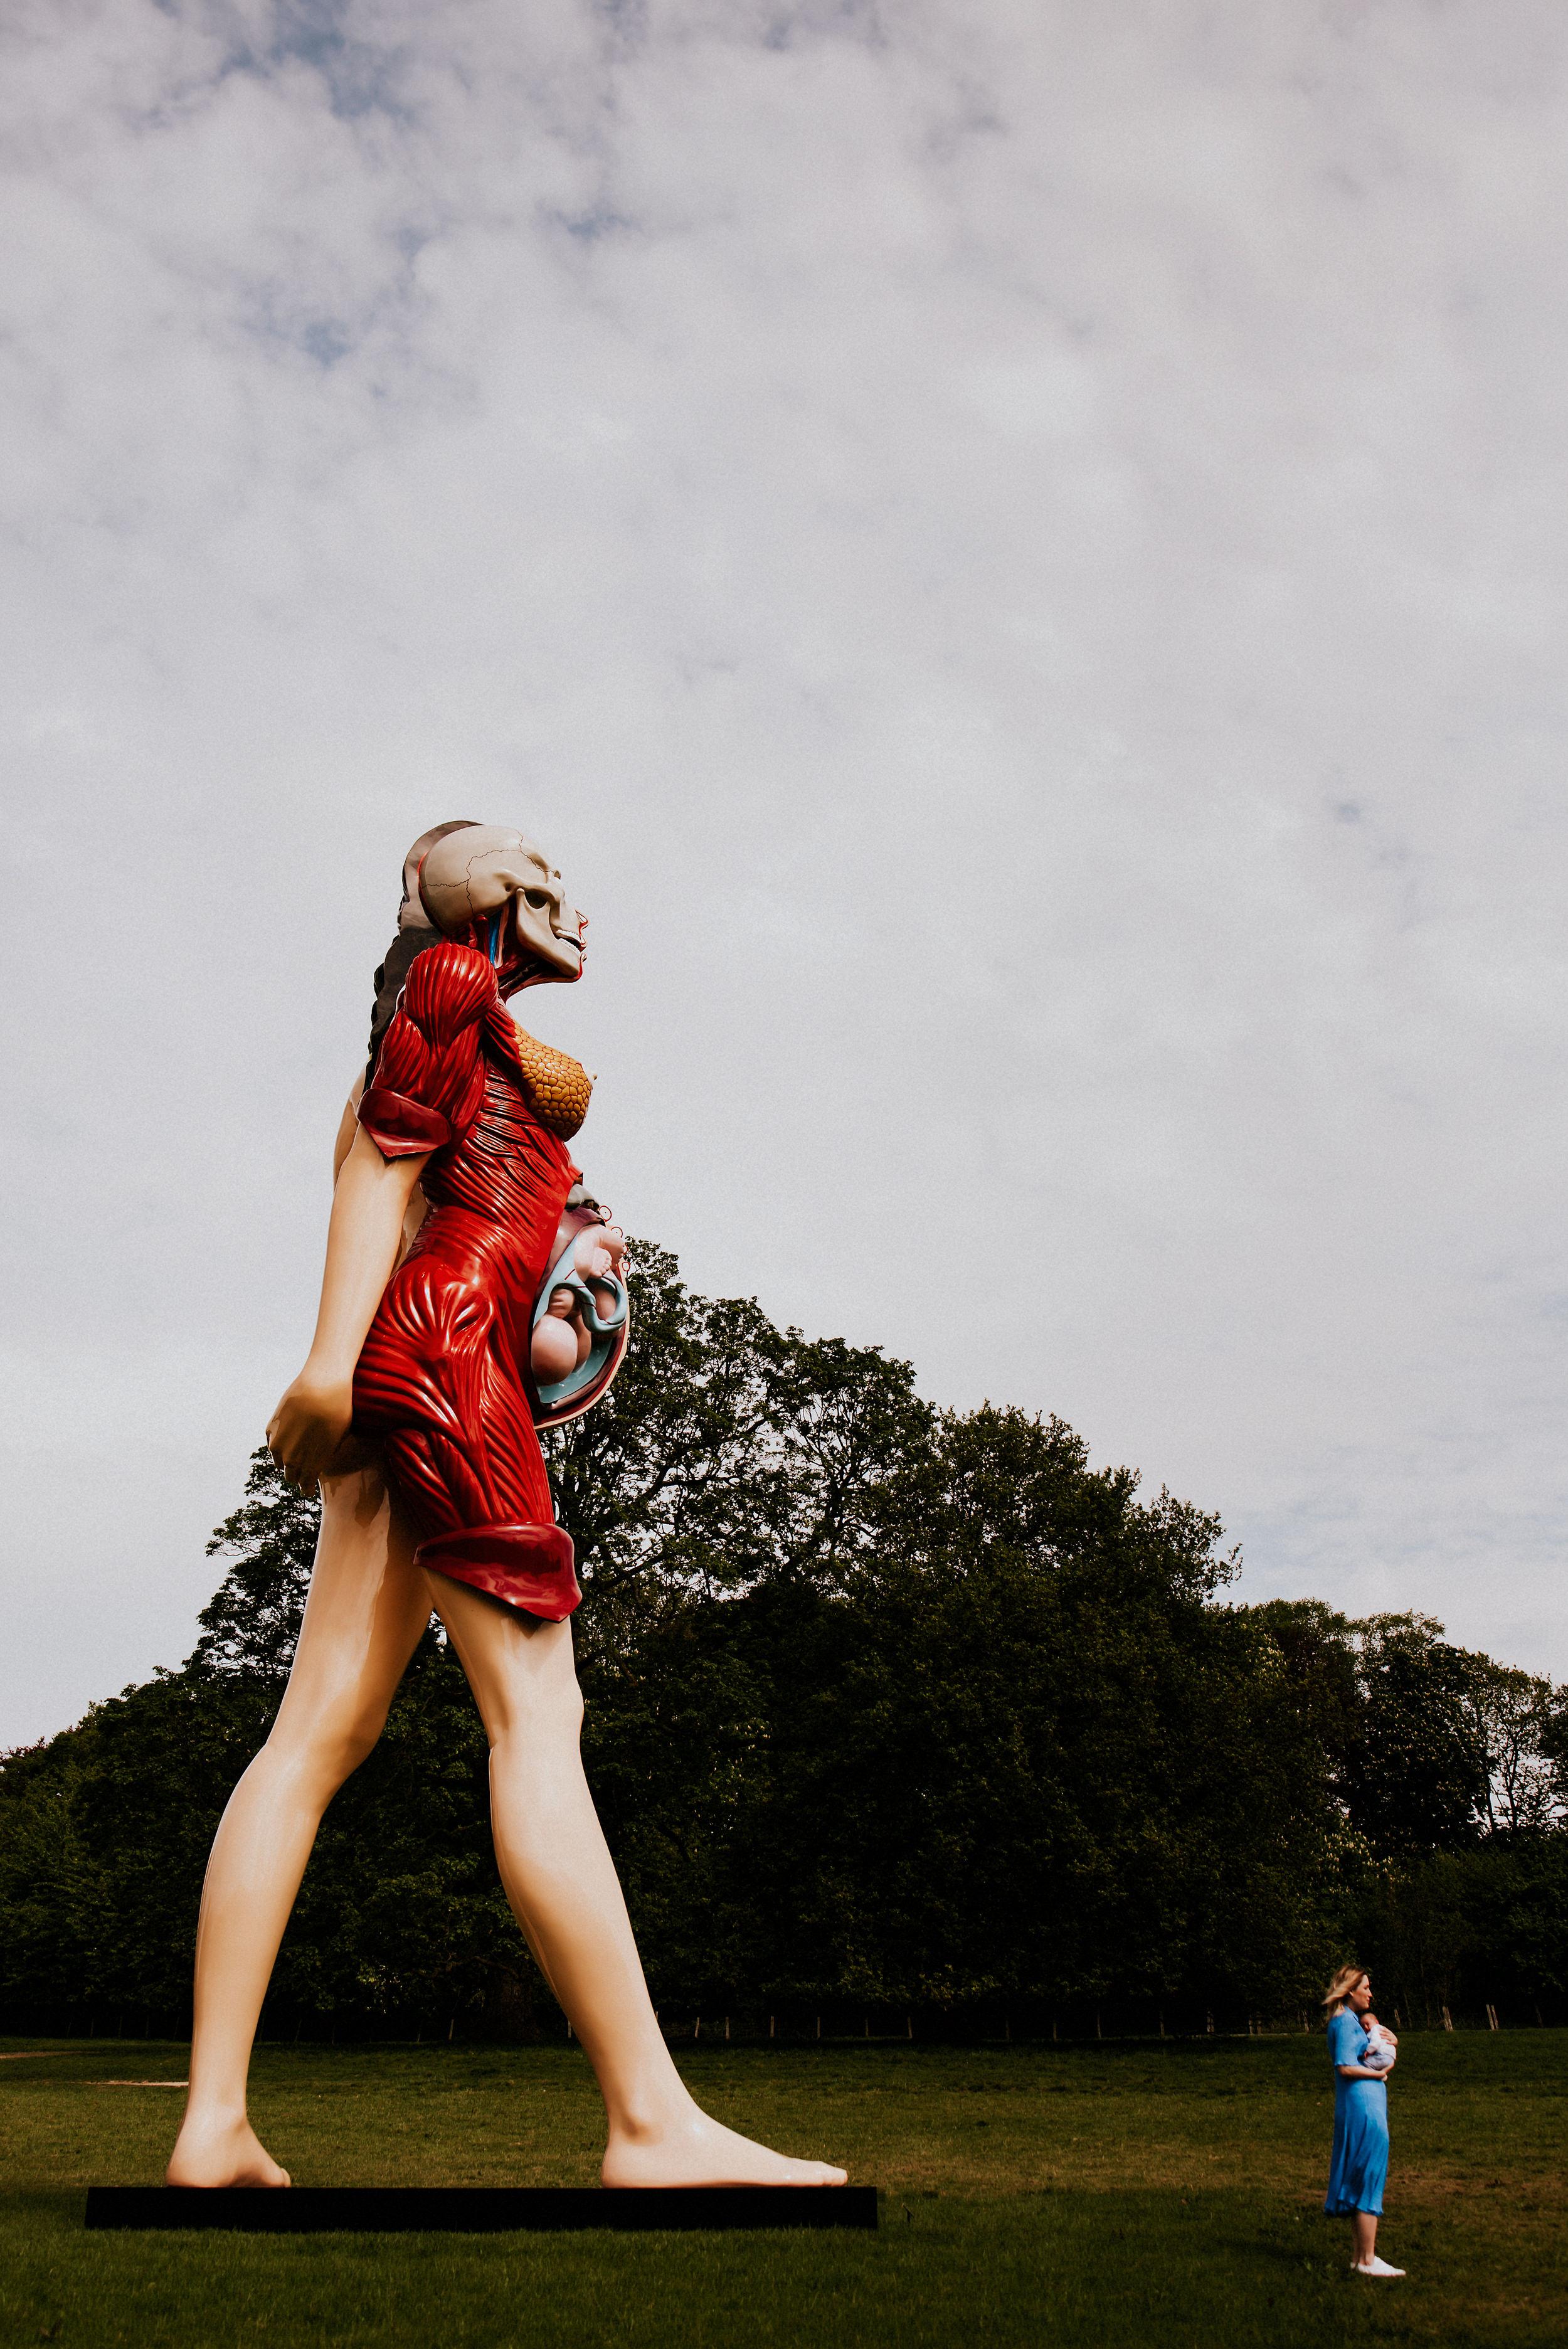 alternative-family-shoot-yorkshire-sculpture-park-photographer-damien-hirst-sculptures-art-family-41.jpg